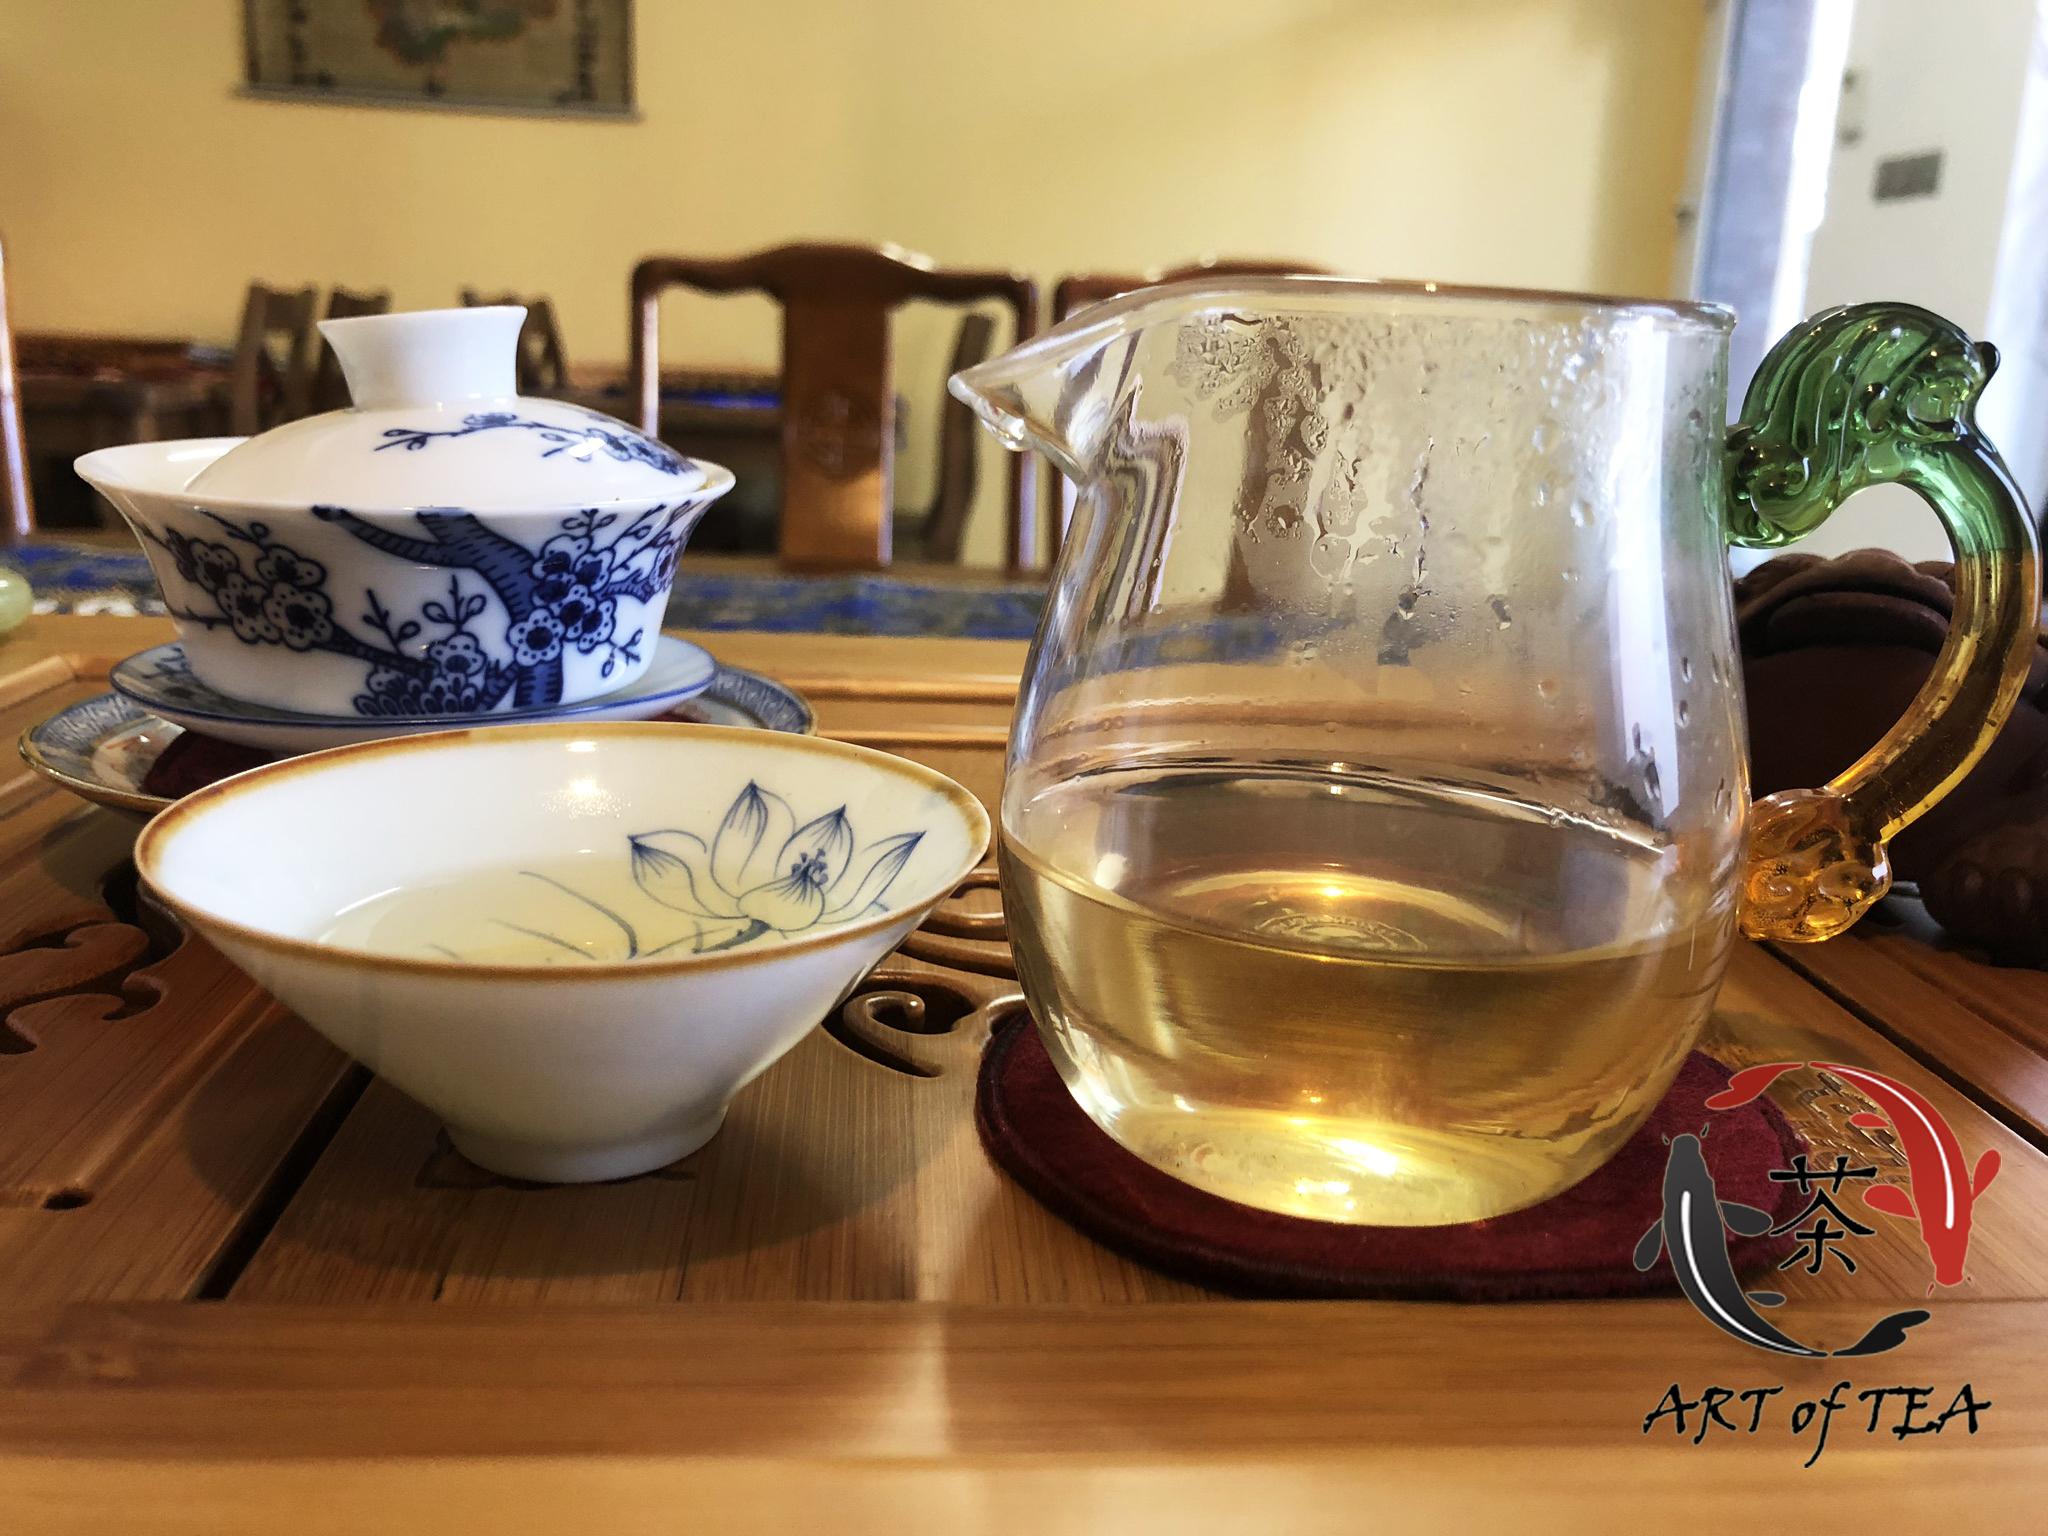 Napar ekskluzywnej żółtej herbaty Jun Shan Yin Zhen